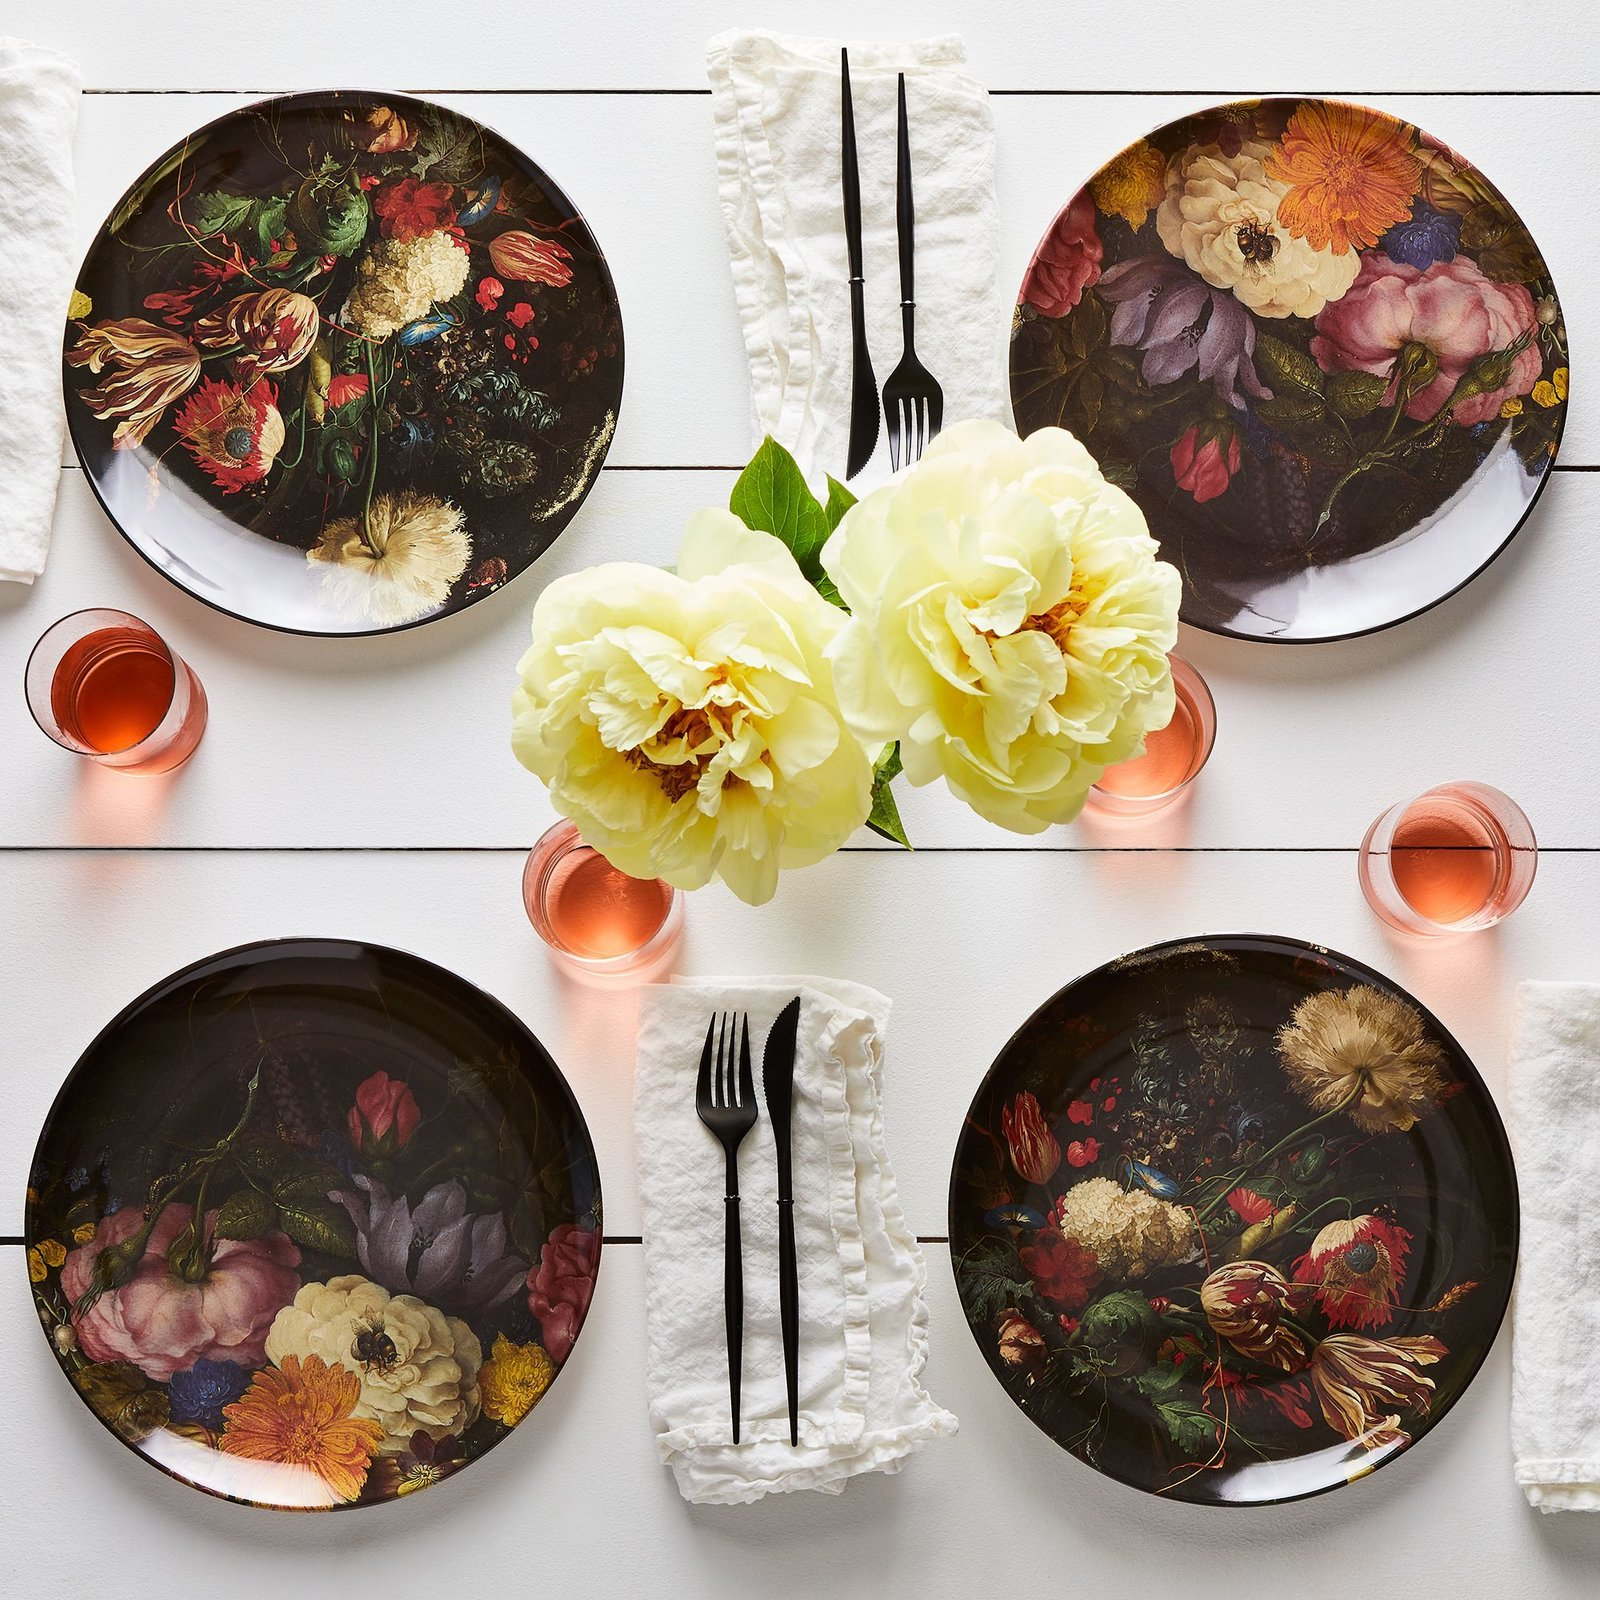 Siren Song Floral Print Melamine Plates (Set of 4)